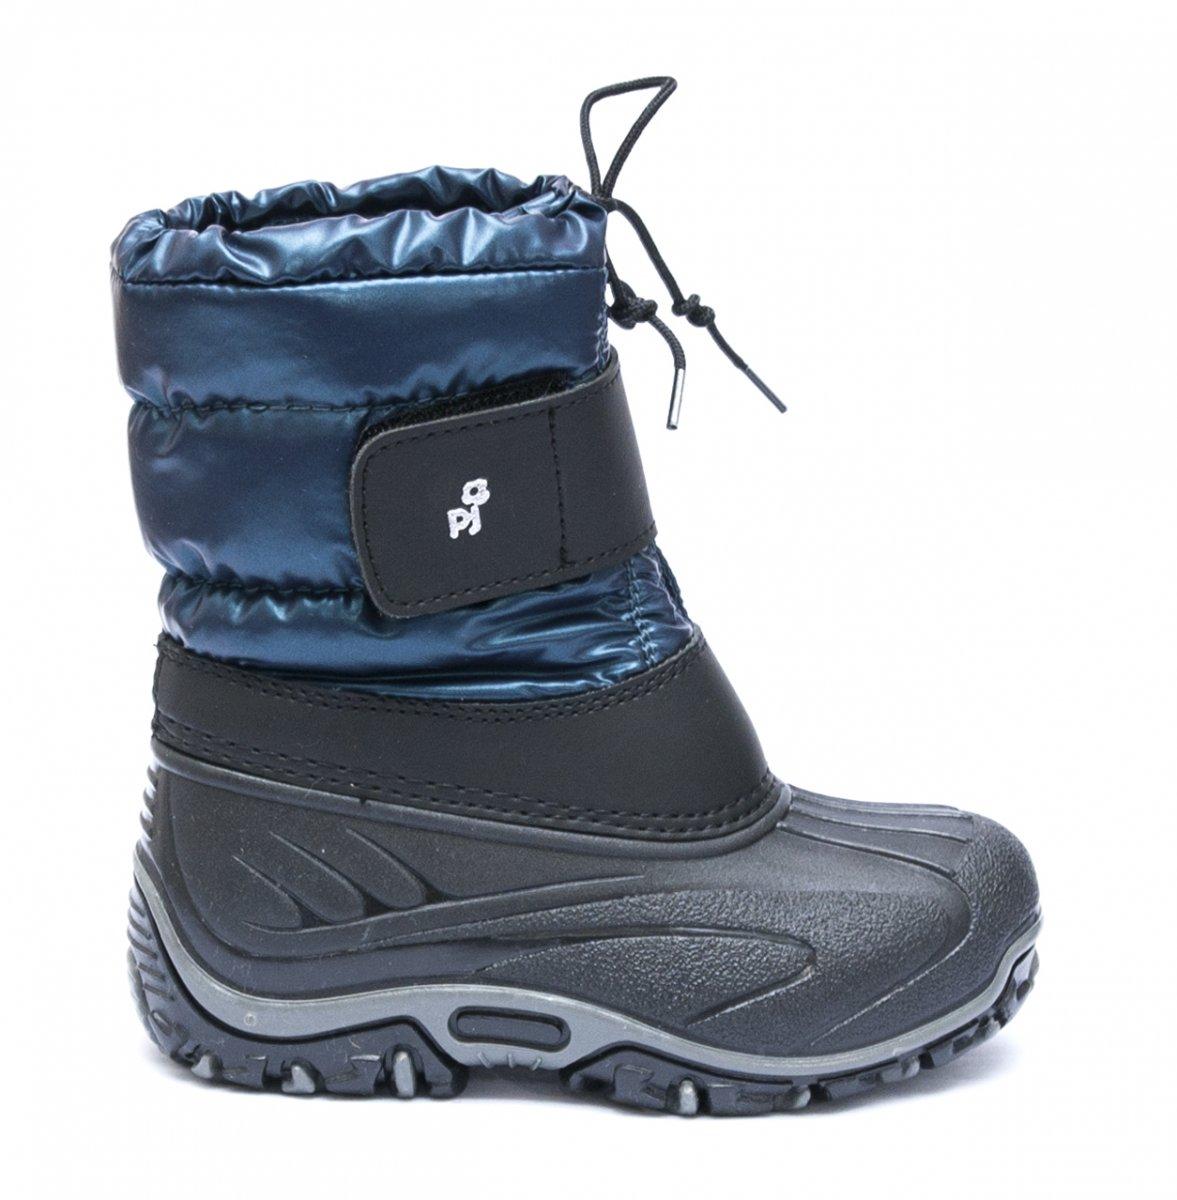 Apreschiuri copii pj shoes Fun albastru negru 21-36